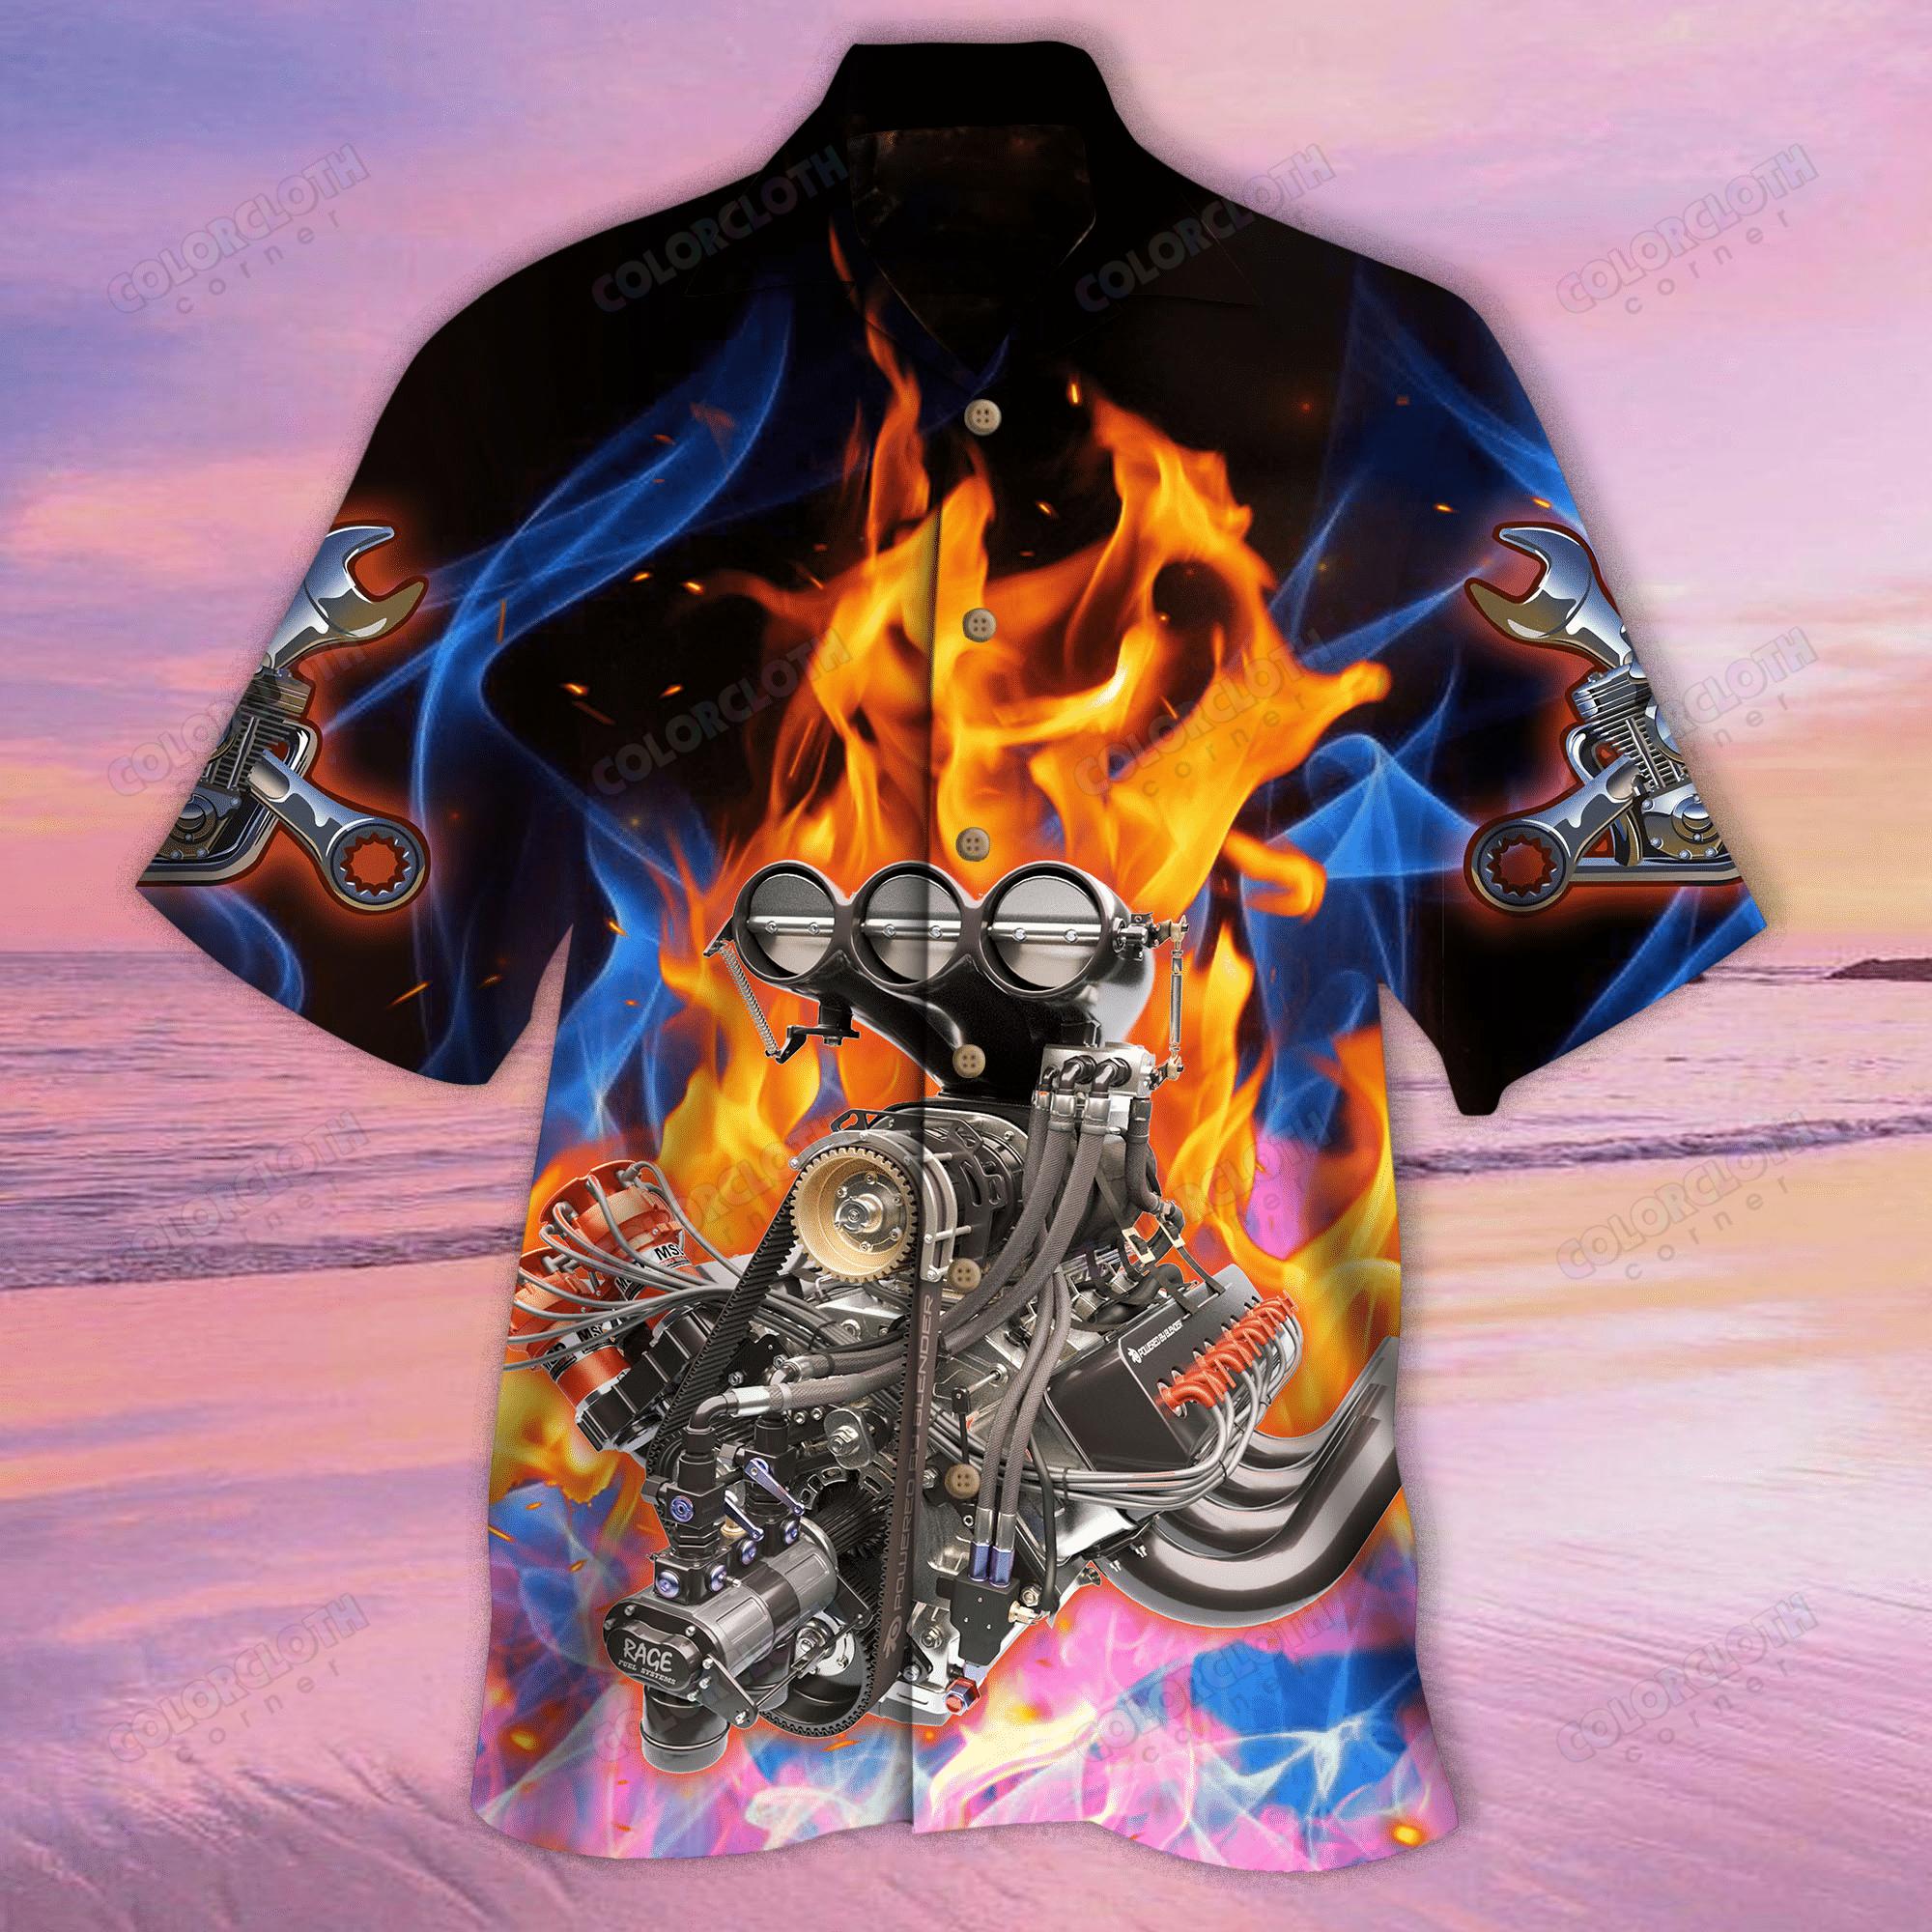 Hot Rod Machine Hawaiian Shirt 02